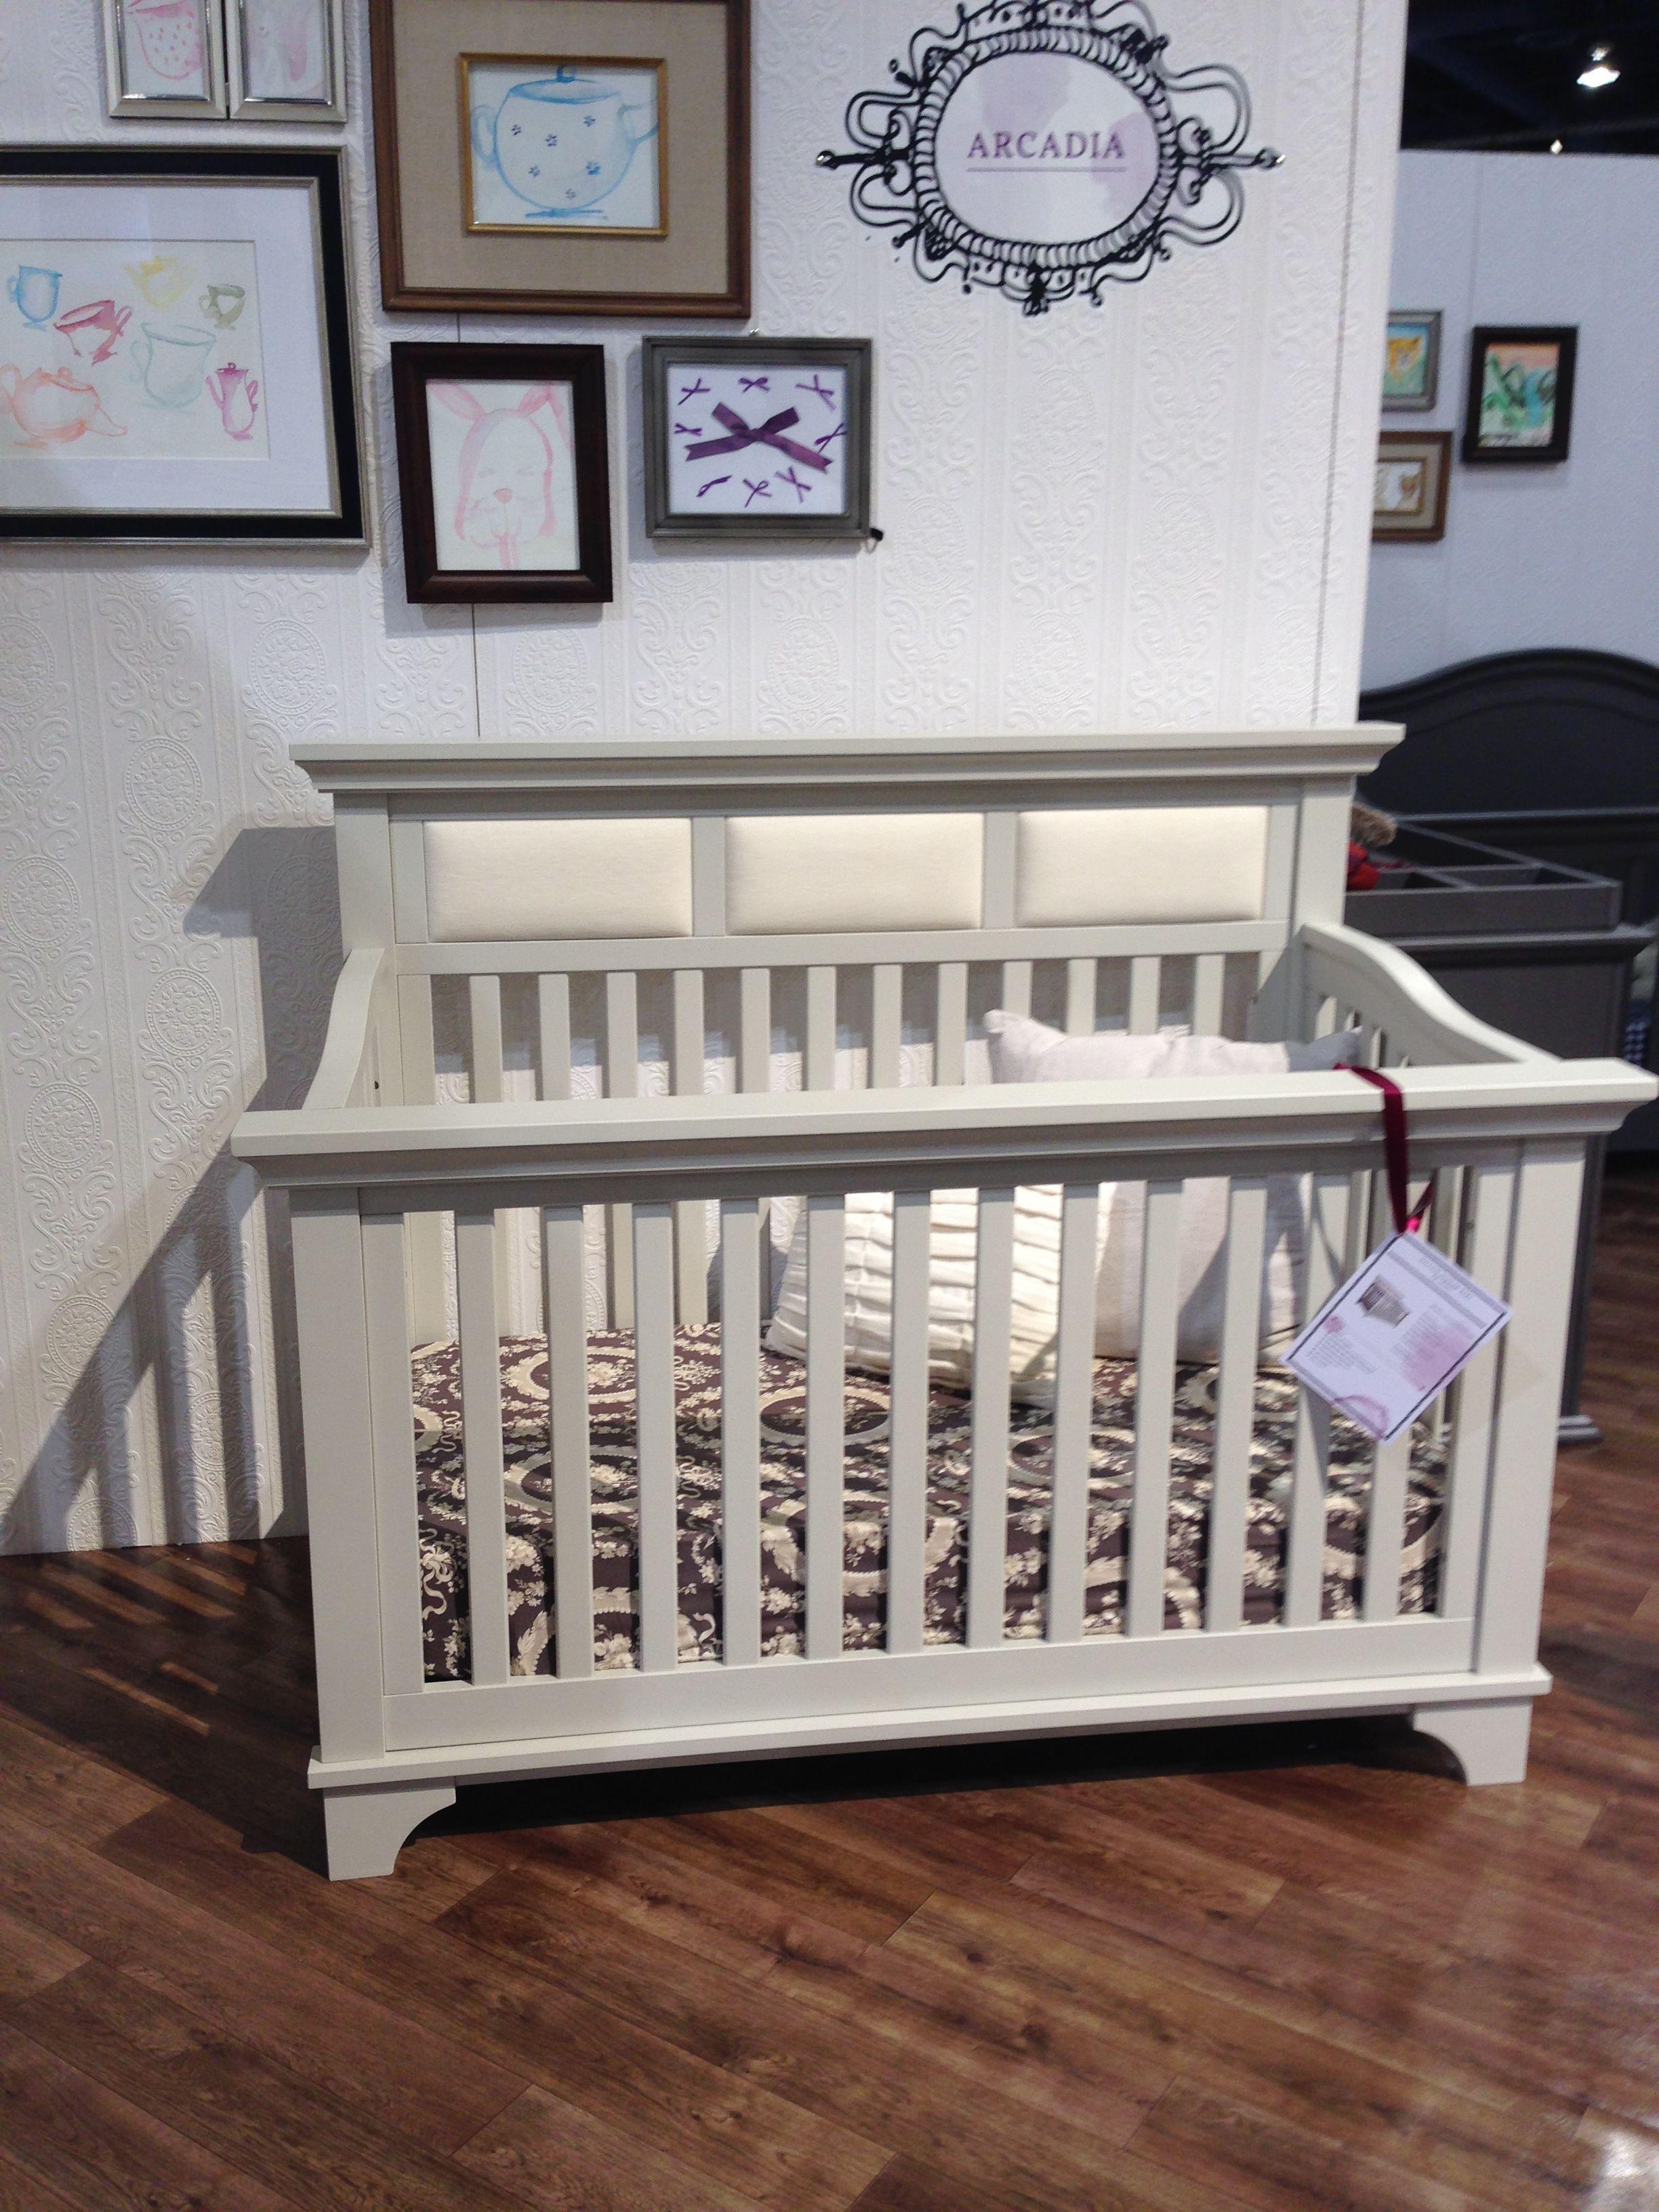 Crib for sale kelowna -  Mdb Playroom Franklin Ben Arcadia Crib Has Linen Panels Built Into The Headboard And We Love